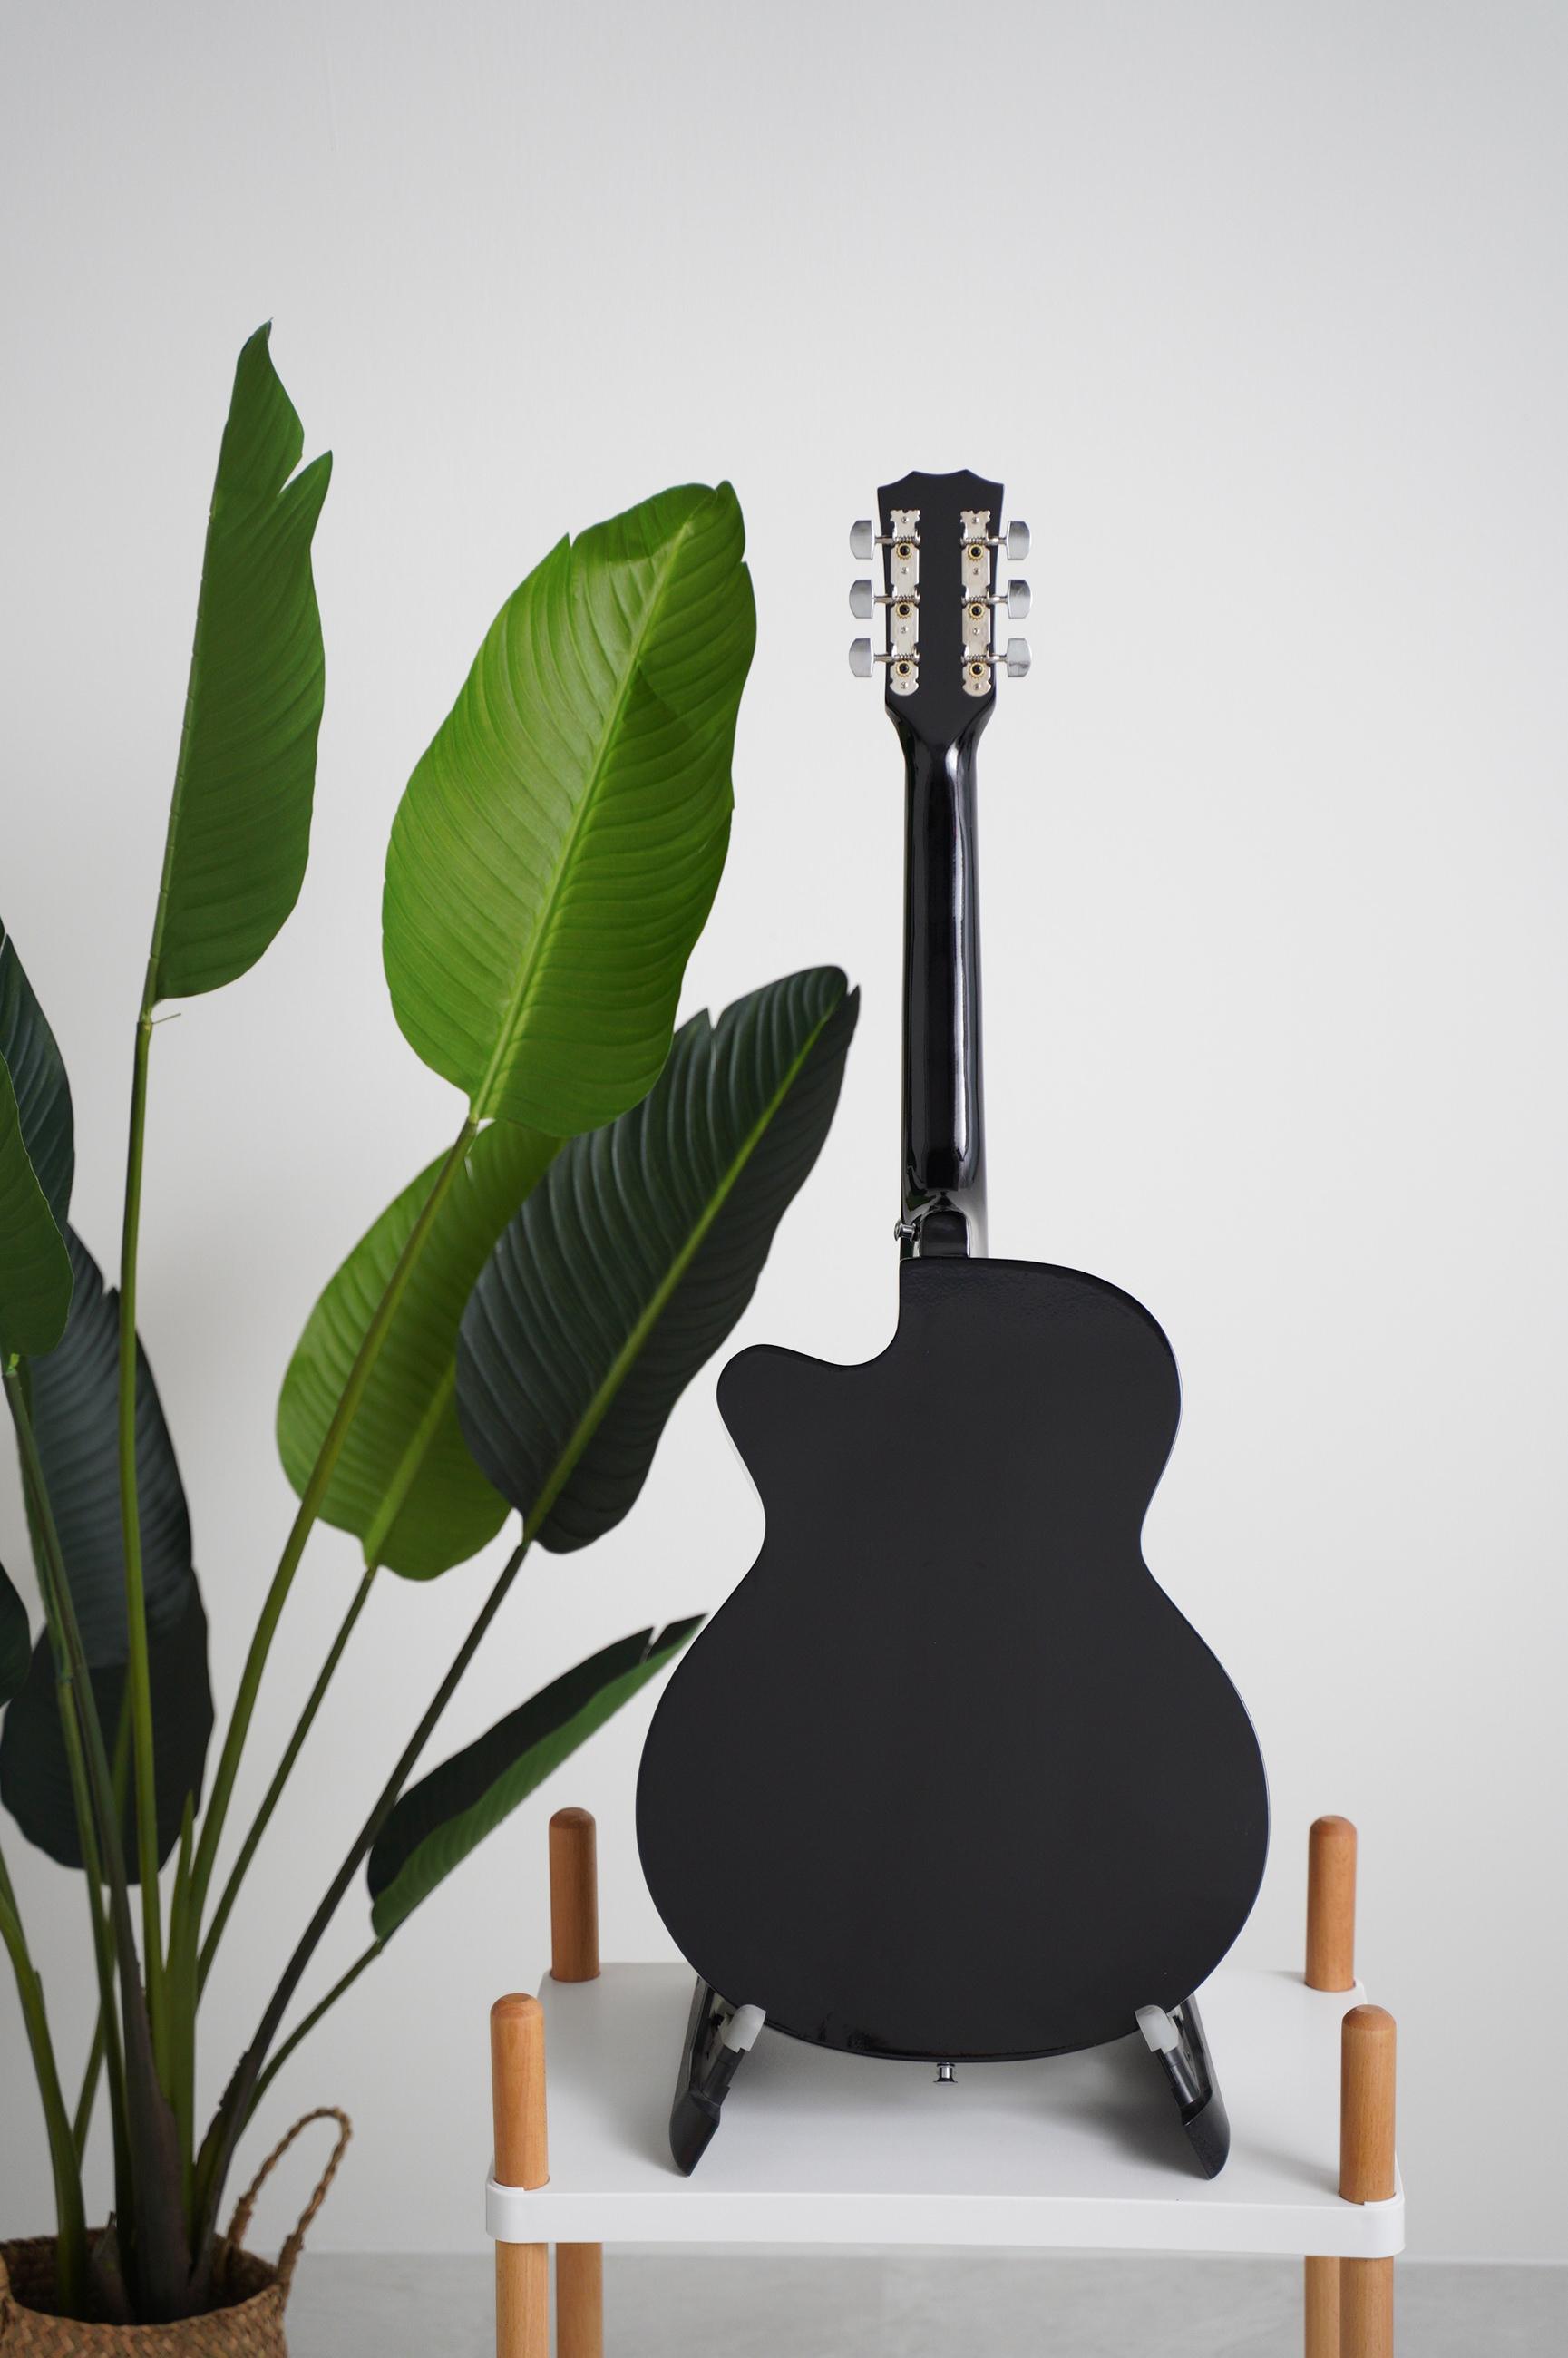 moly-ag-38-bk-acoustic-guitar-singapore-10.jpg